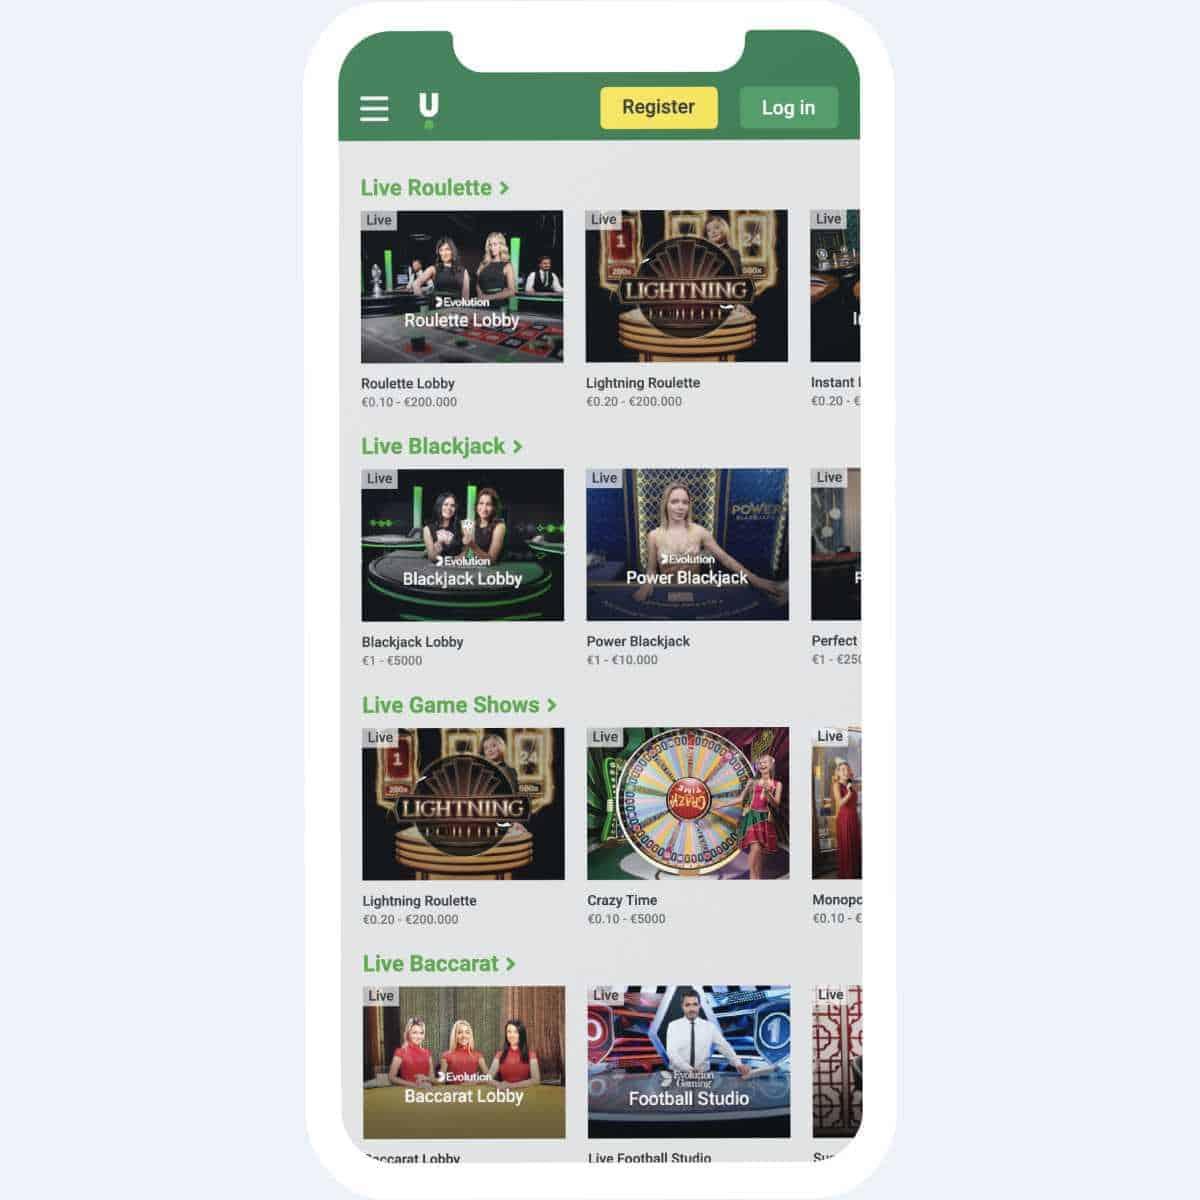 unibet live games mobile